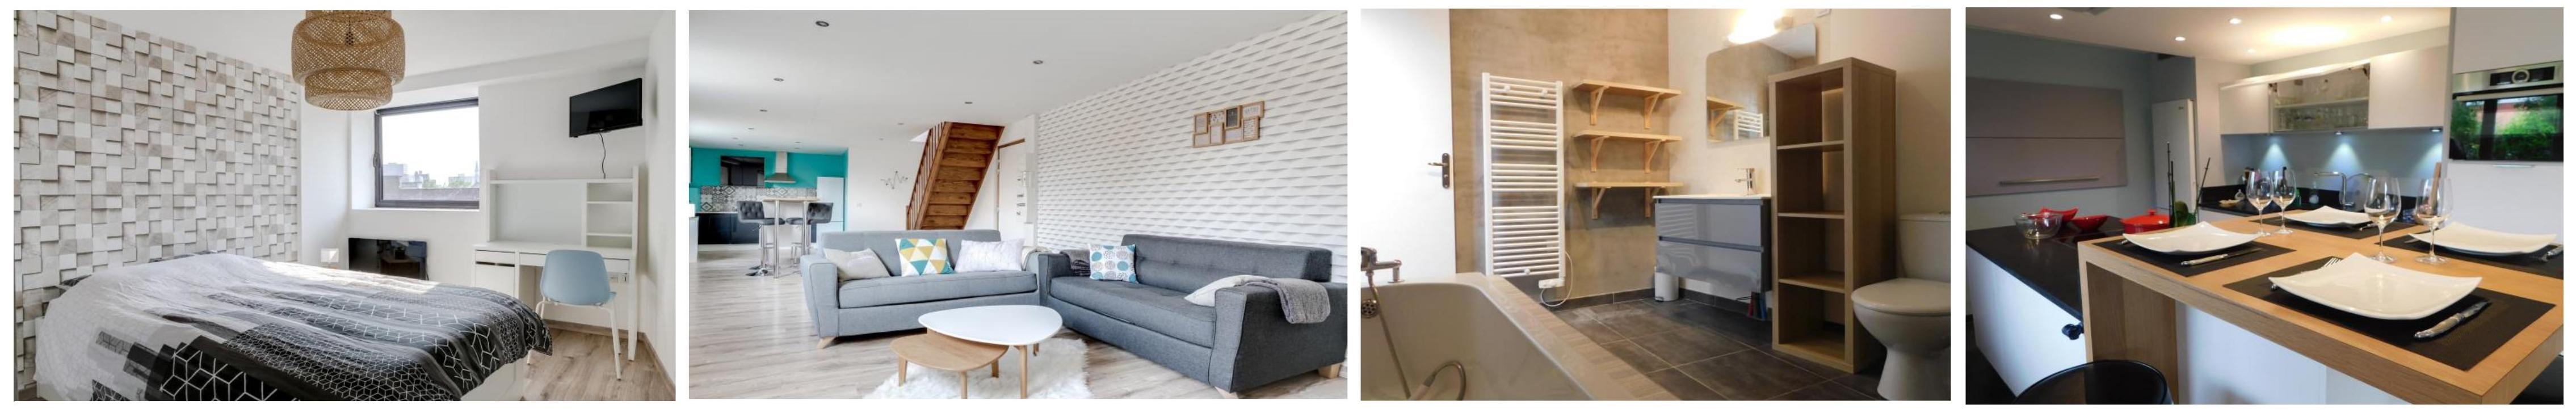 ma d co de f e d coratrice int rieur nord cambrai valenciennes arras. Black Bedroom Furniture Sets. Home Design Ideas